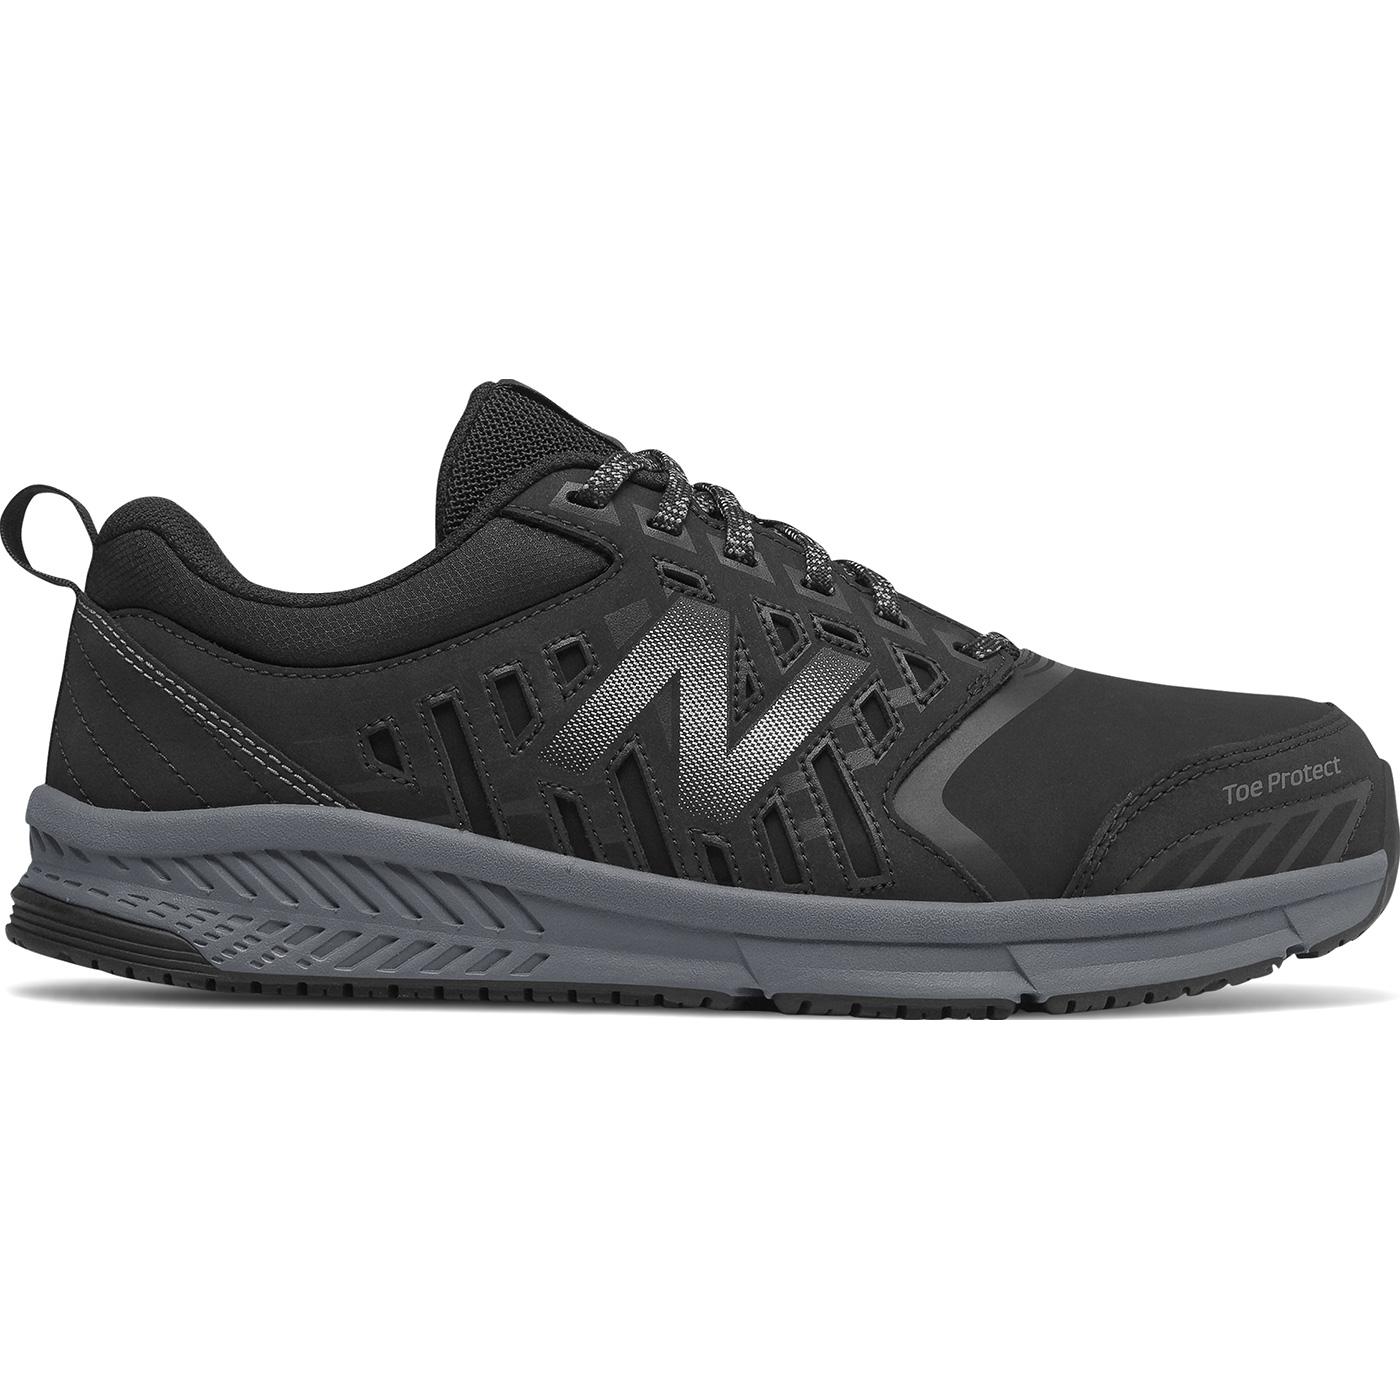 low priced 9770d e3164 New Balance 412v1 Men s Alloy Toe Black Athletic Work ShoesNew Balance  412v1 Men s Alloy Toe Black Athletic Work Shoes,